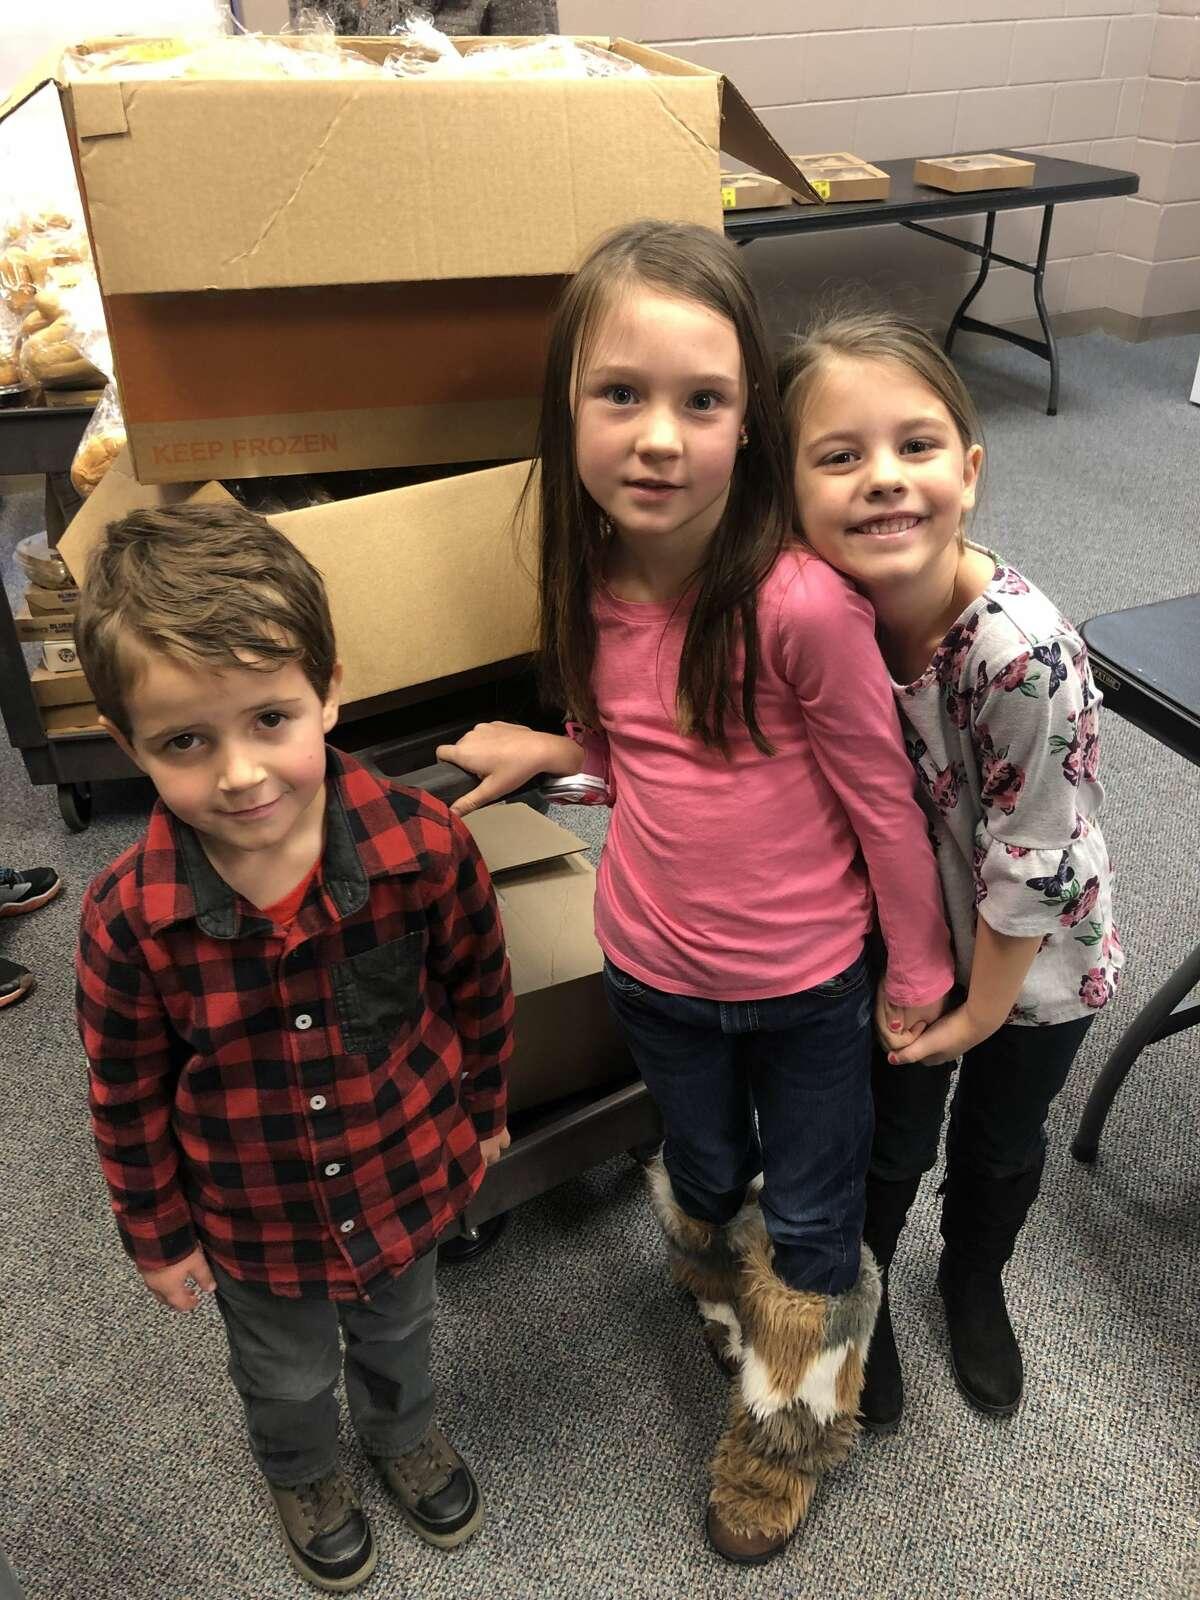 Food pantry: Noah Aldrin, from left, Kenley Green and Emma Horner